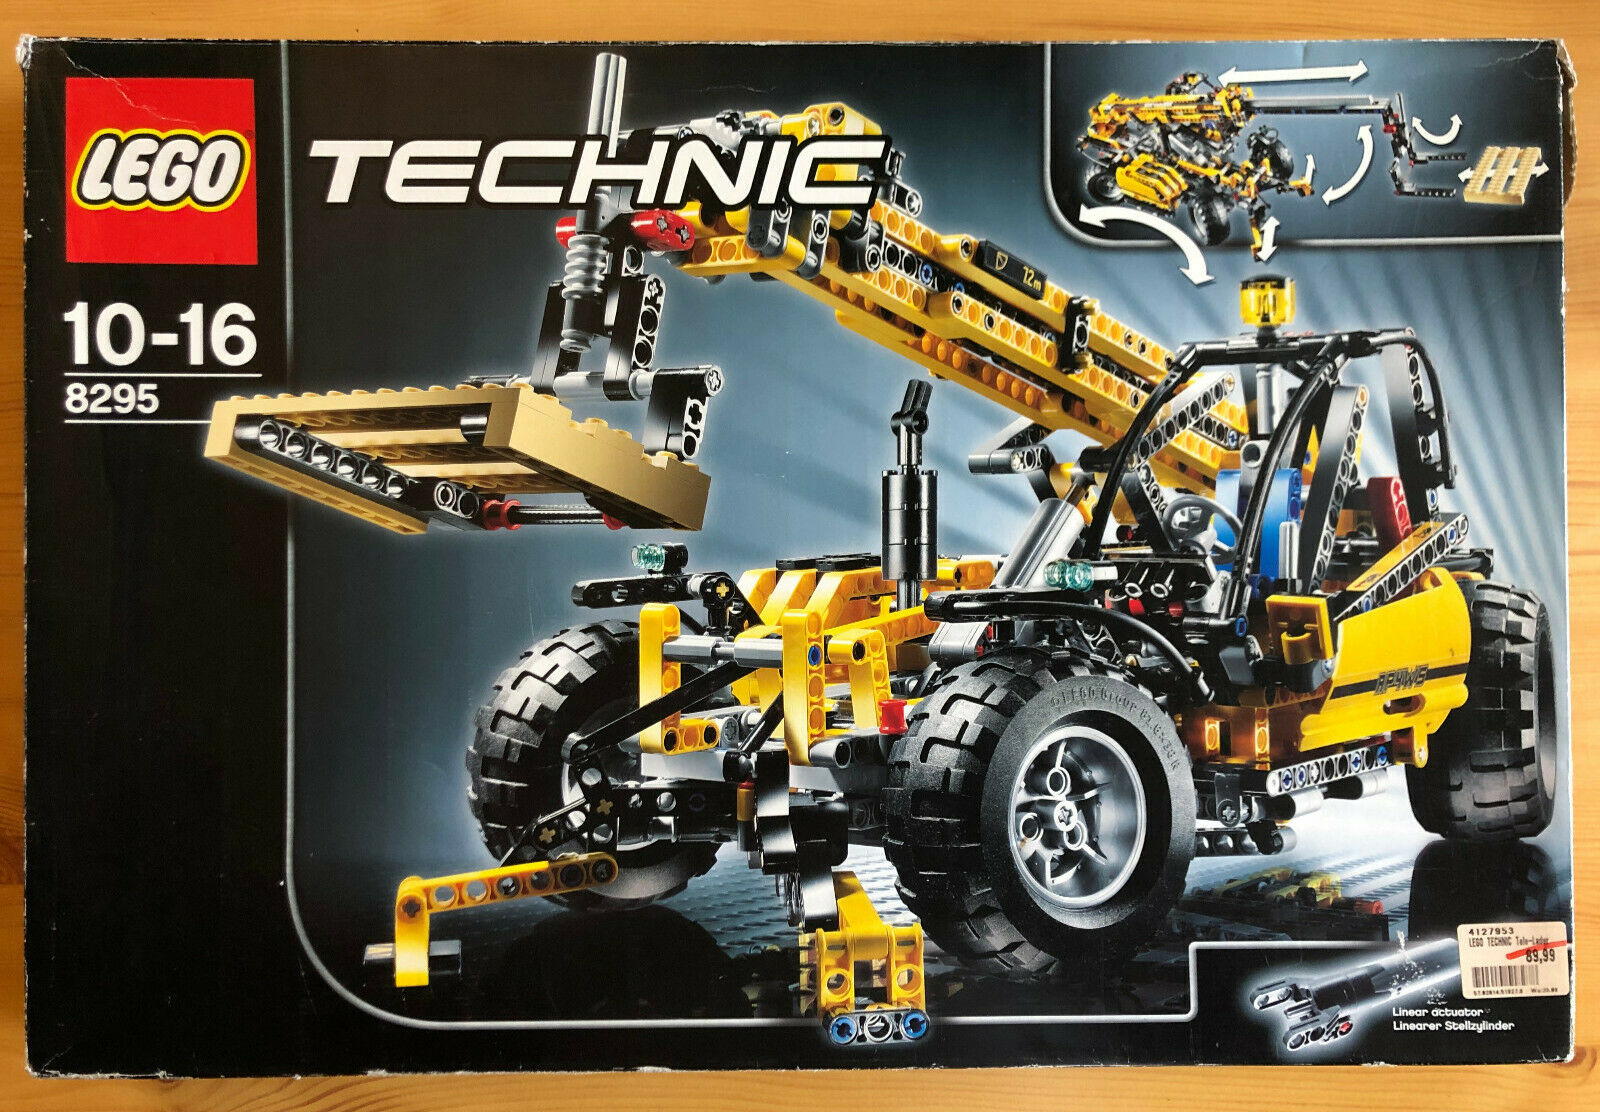 1x Lego Technic Set Modell Construction 8295 gelb Teleskop Lader unvollständig